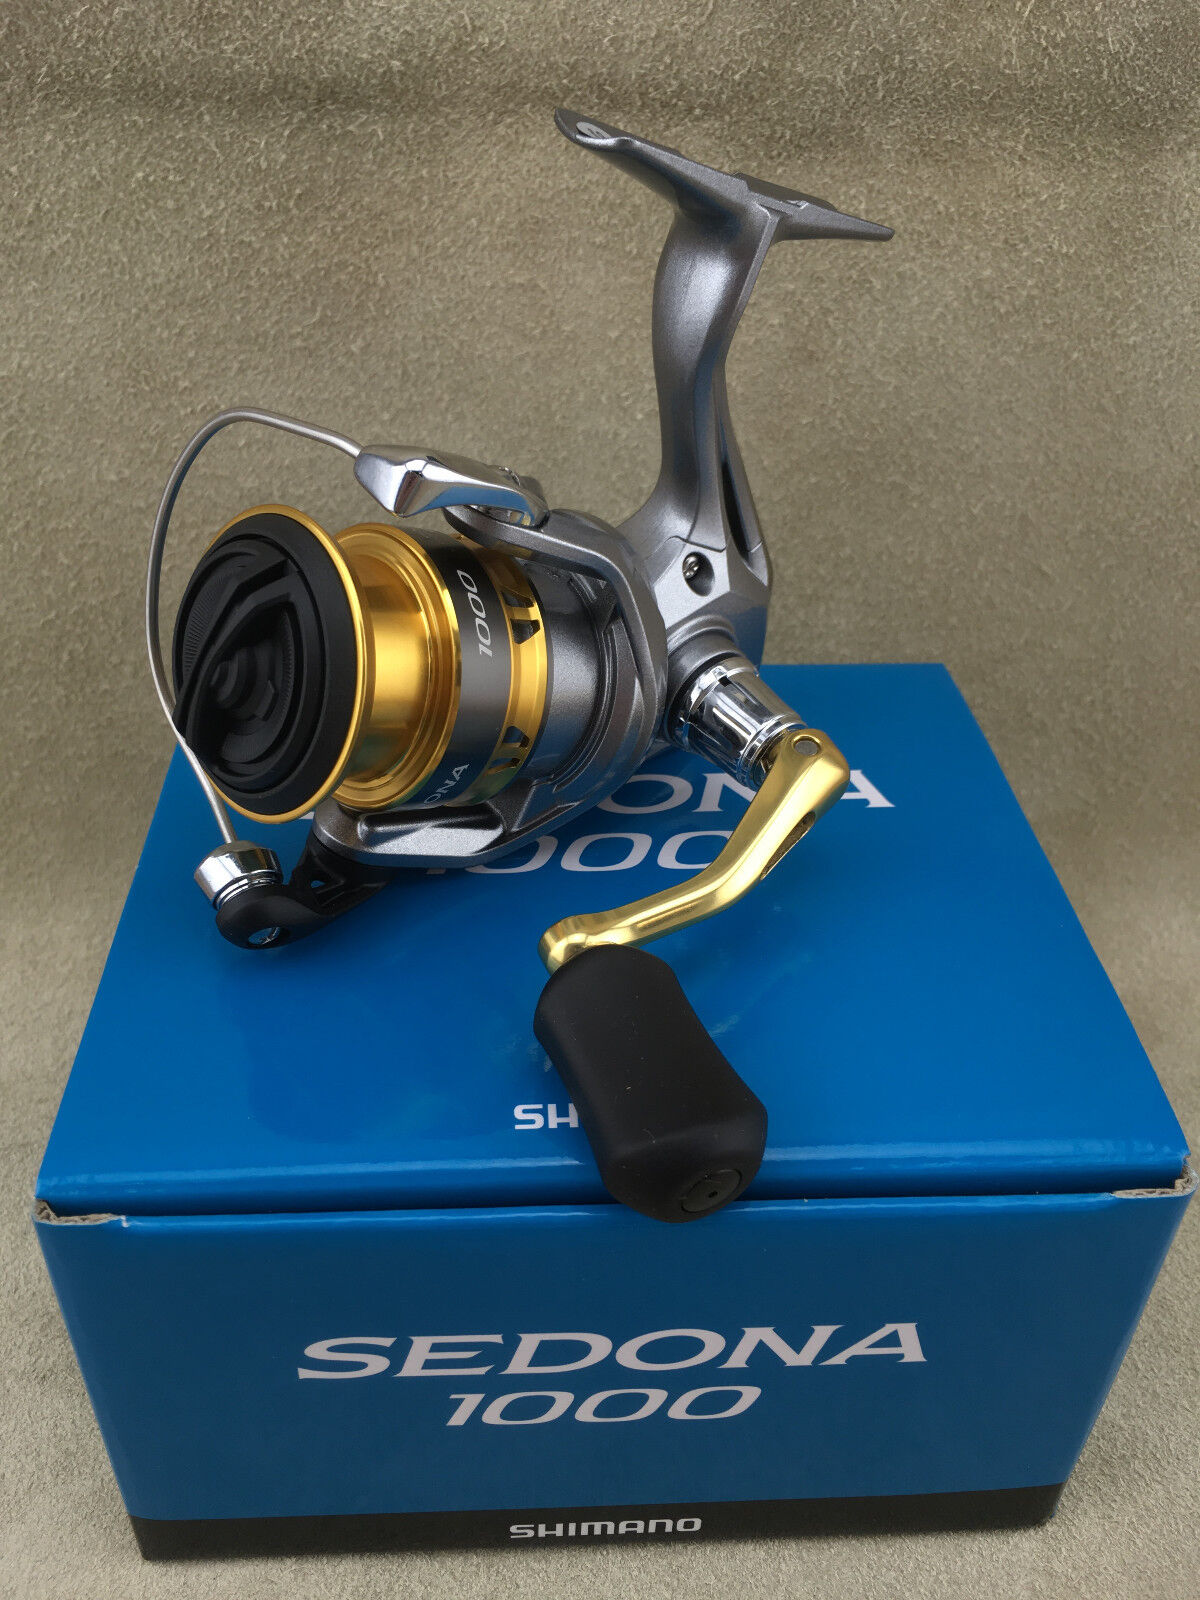 Shimano Sedona Fi Spinning Carretes Arrastre Frontal Frontal Frontal 1000 - 5000 Varios Tamaños f4ba6f